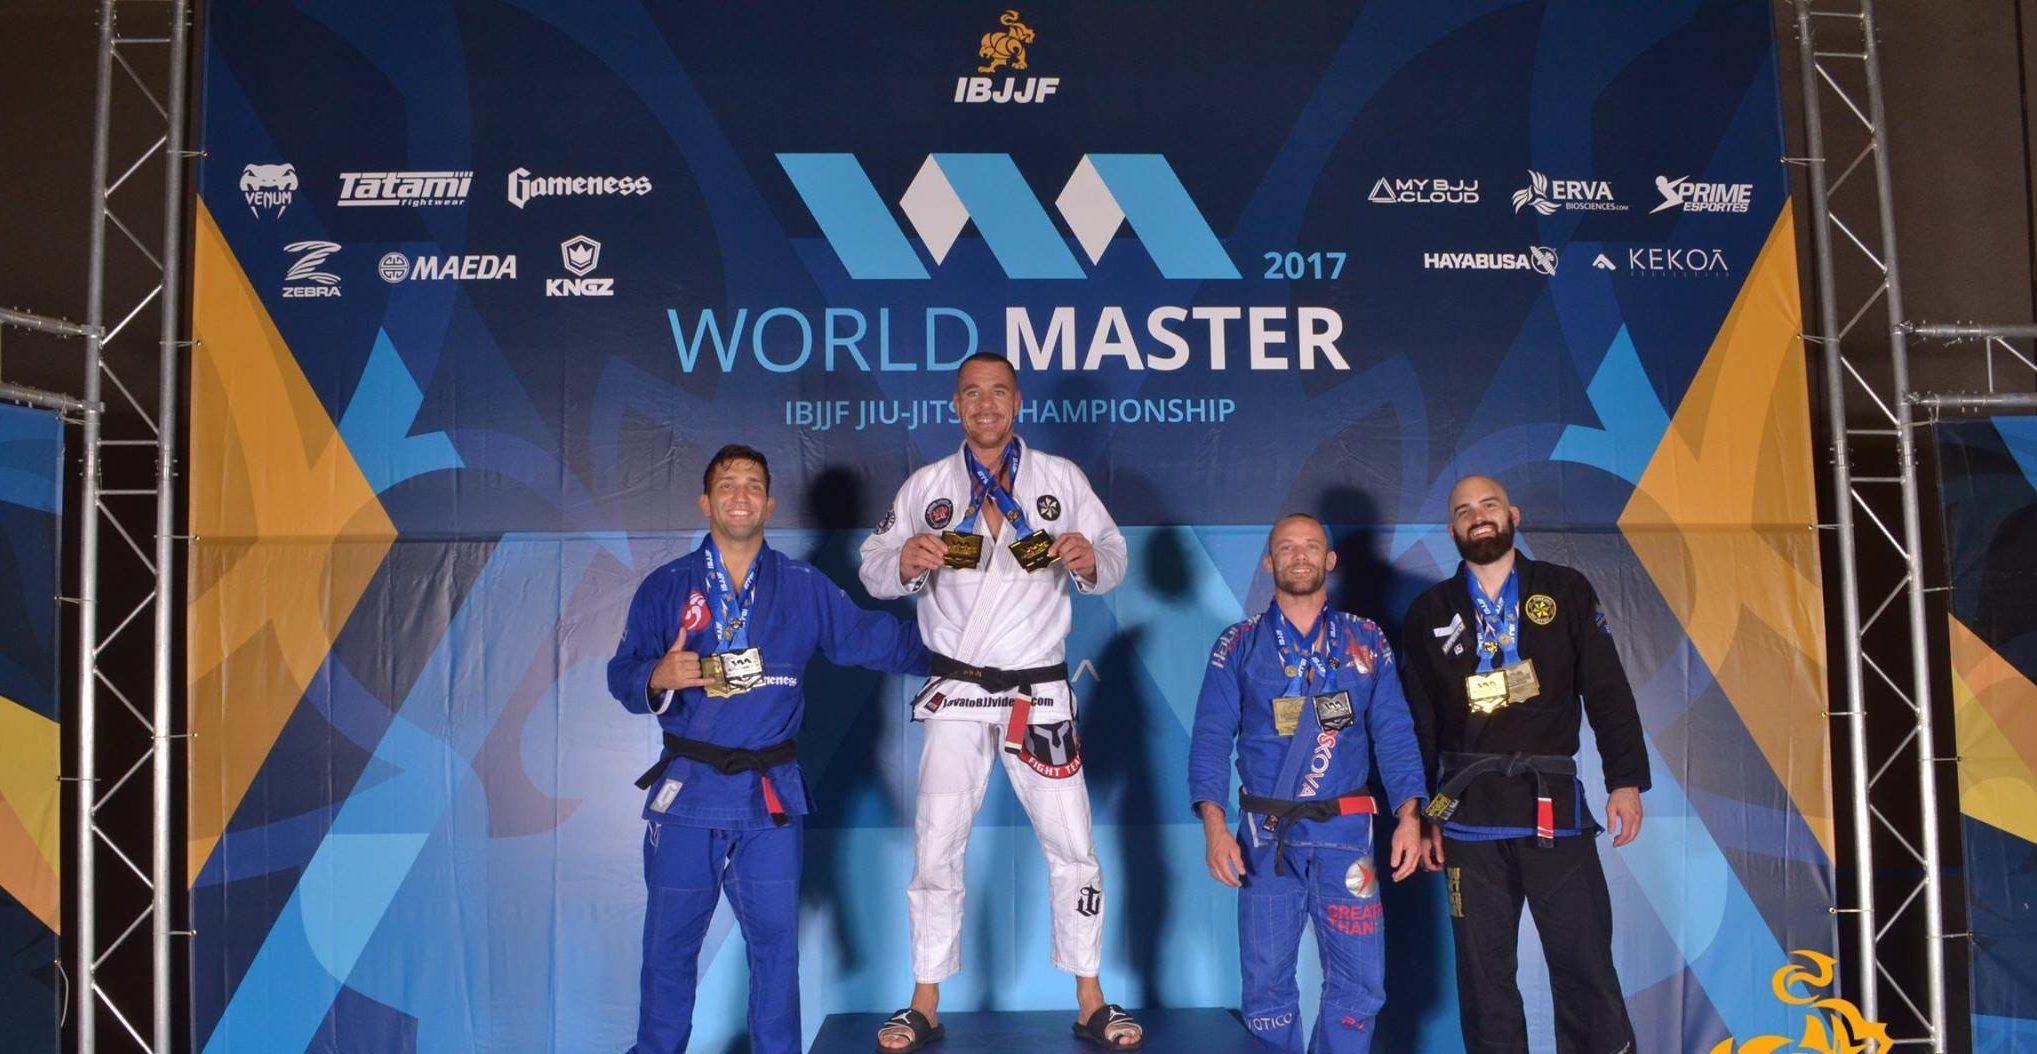 Rafael Lovato Jr. e Guto Campos conquistam ouro duplo no primeiro dia do Mundial Master